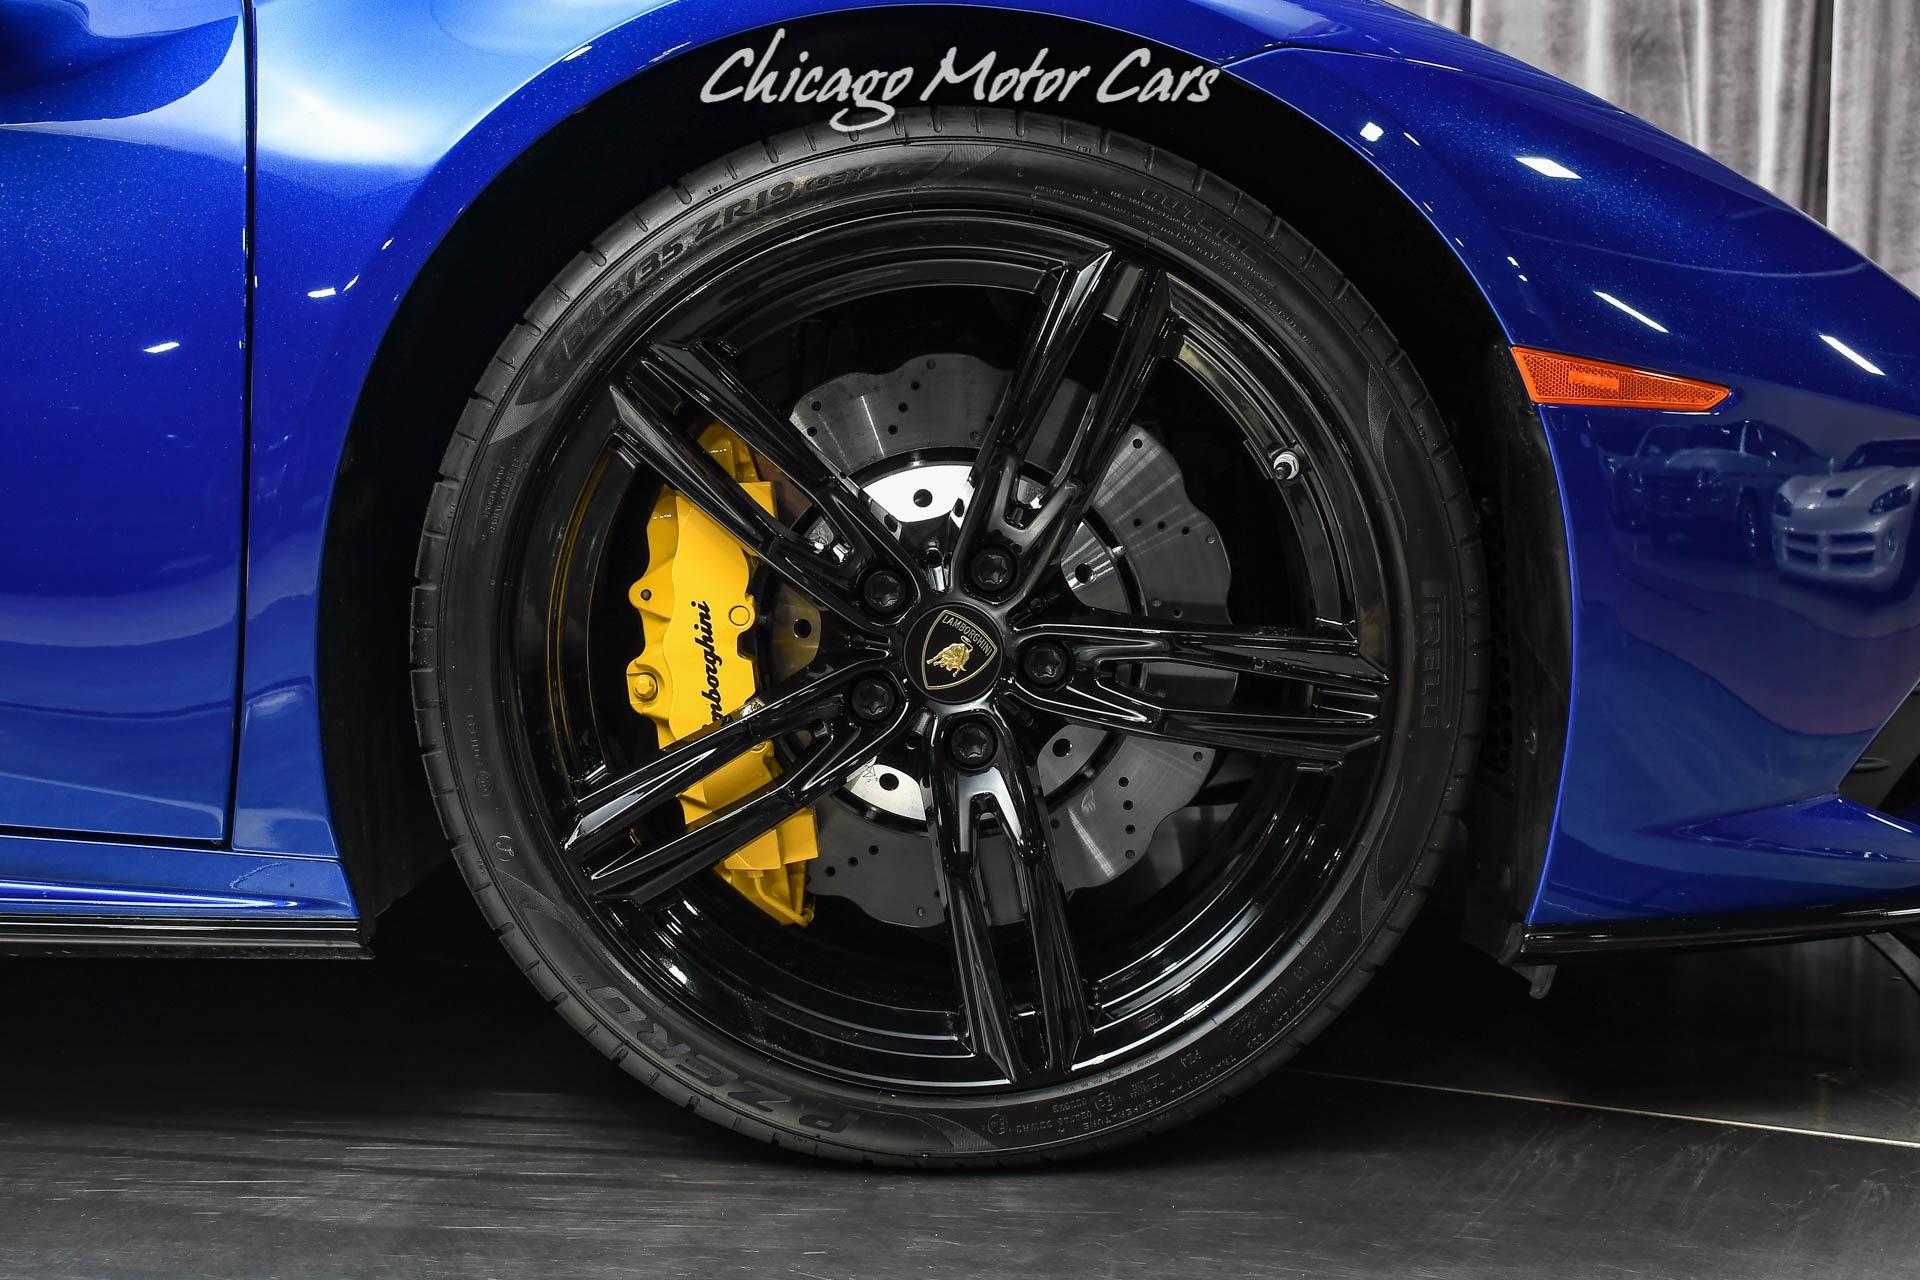 Used-2021-Lamborghini-Huracan-EVO-Spyder-Stunning-Blu-Sideris-Paint-Q-Citura-Stitching-LOW-Miles